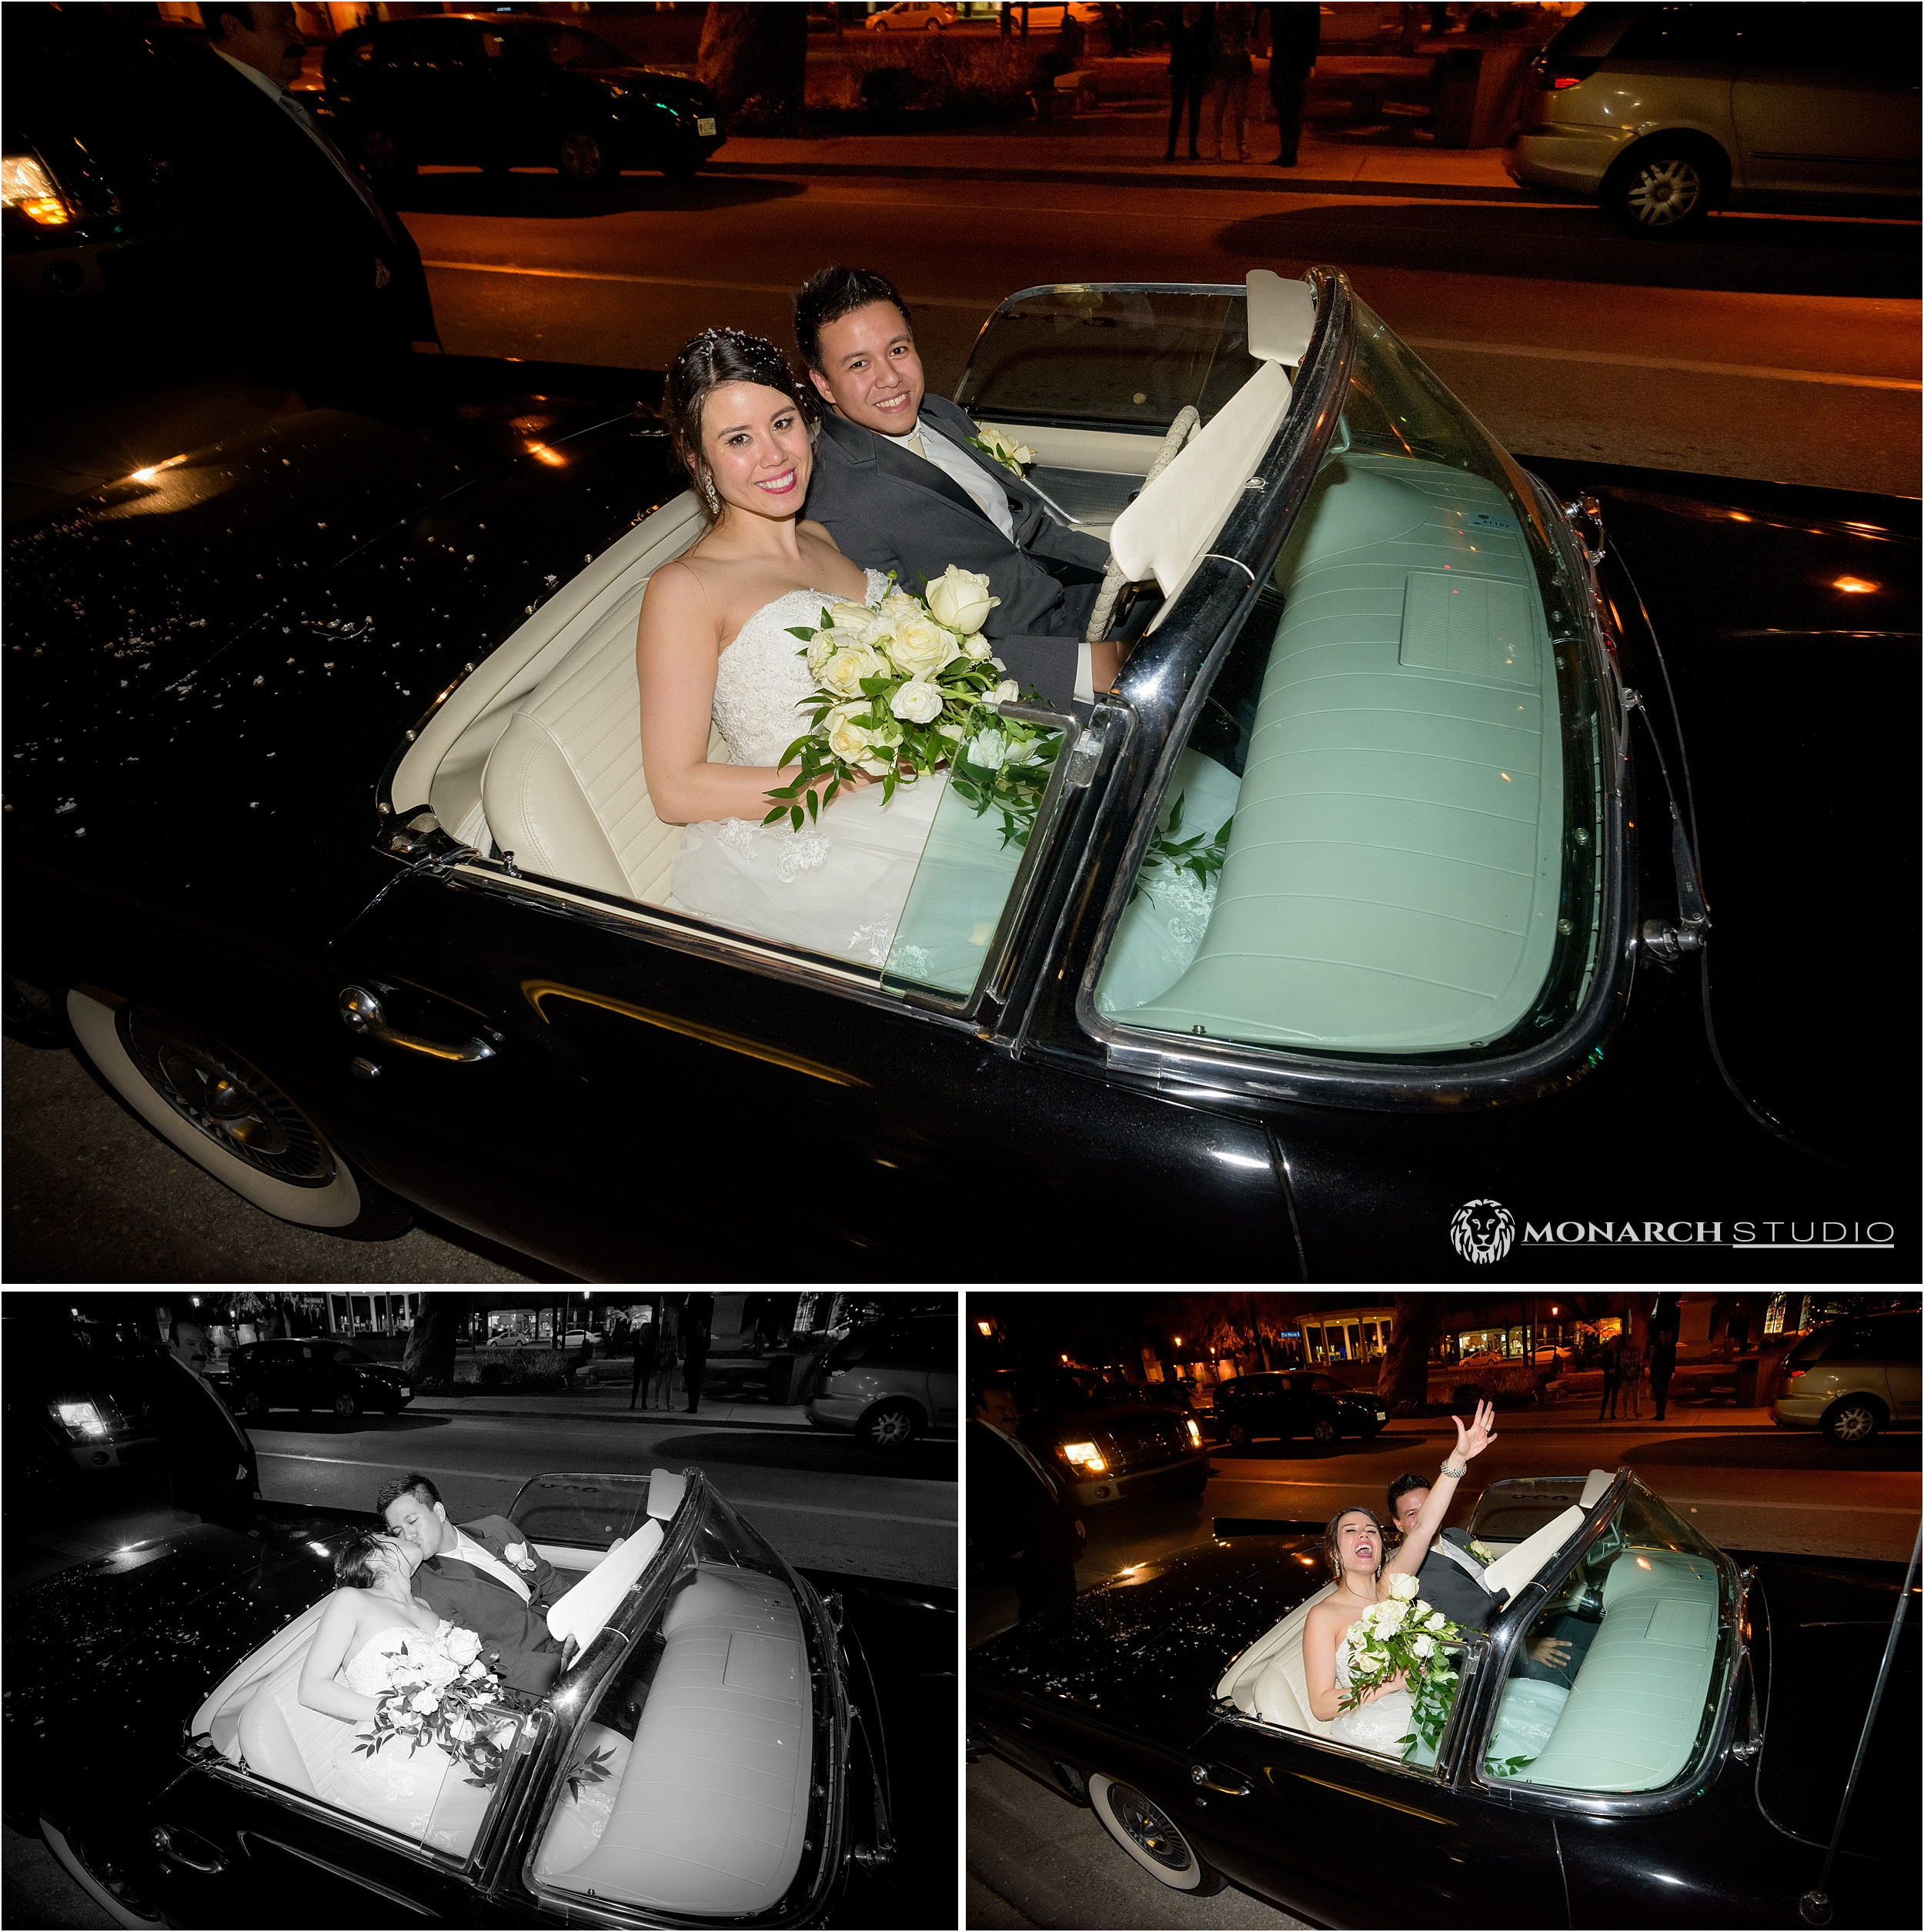 wedding-photographer-in-st-augustine-florida-treasury-127.jpg